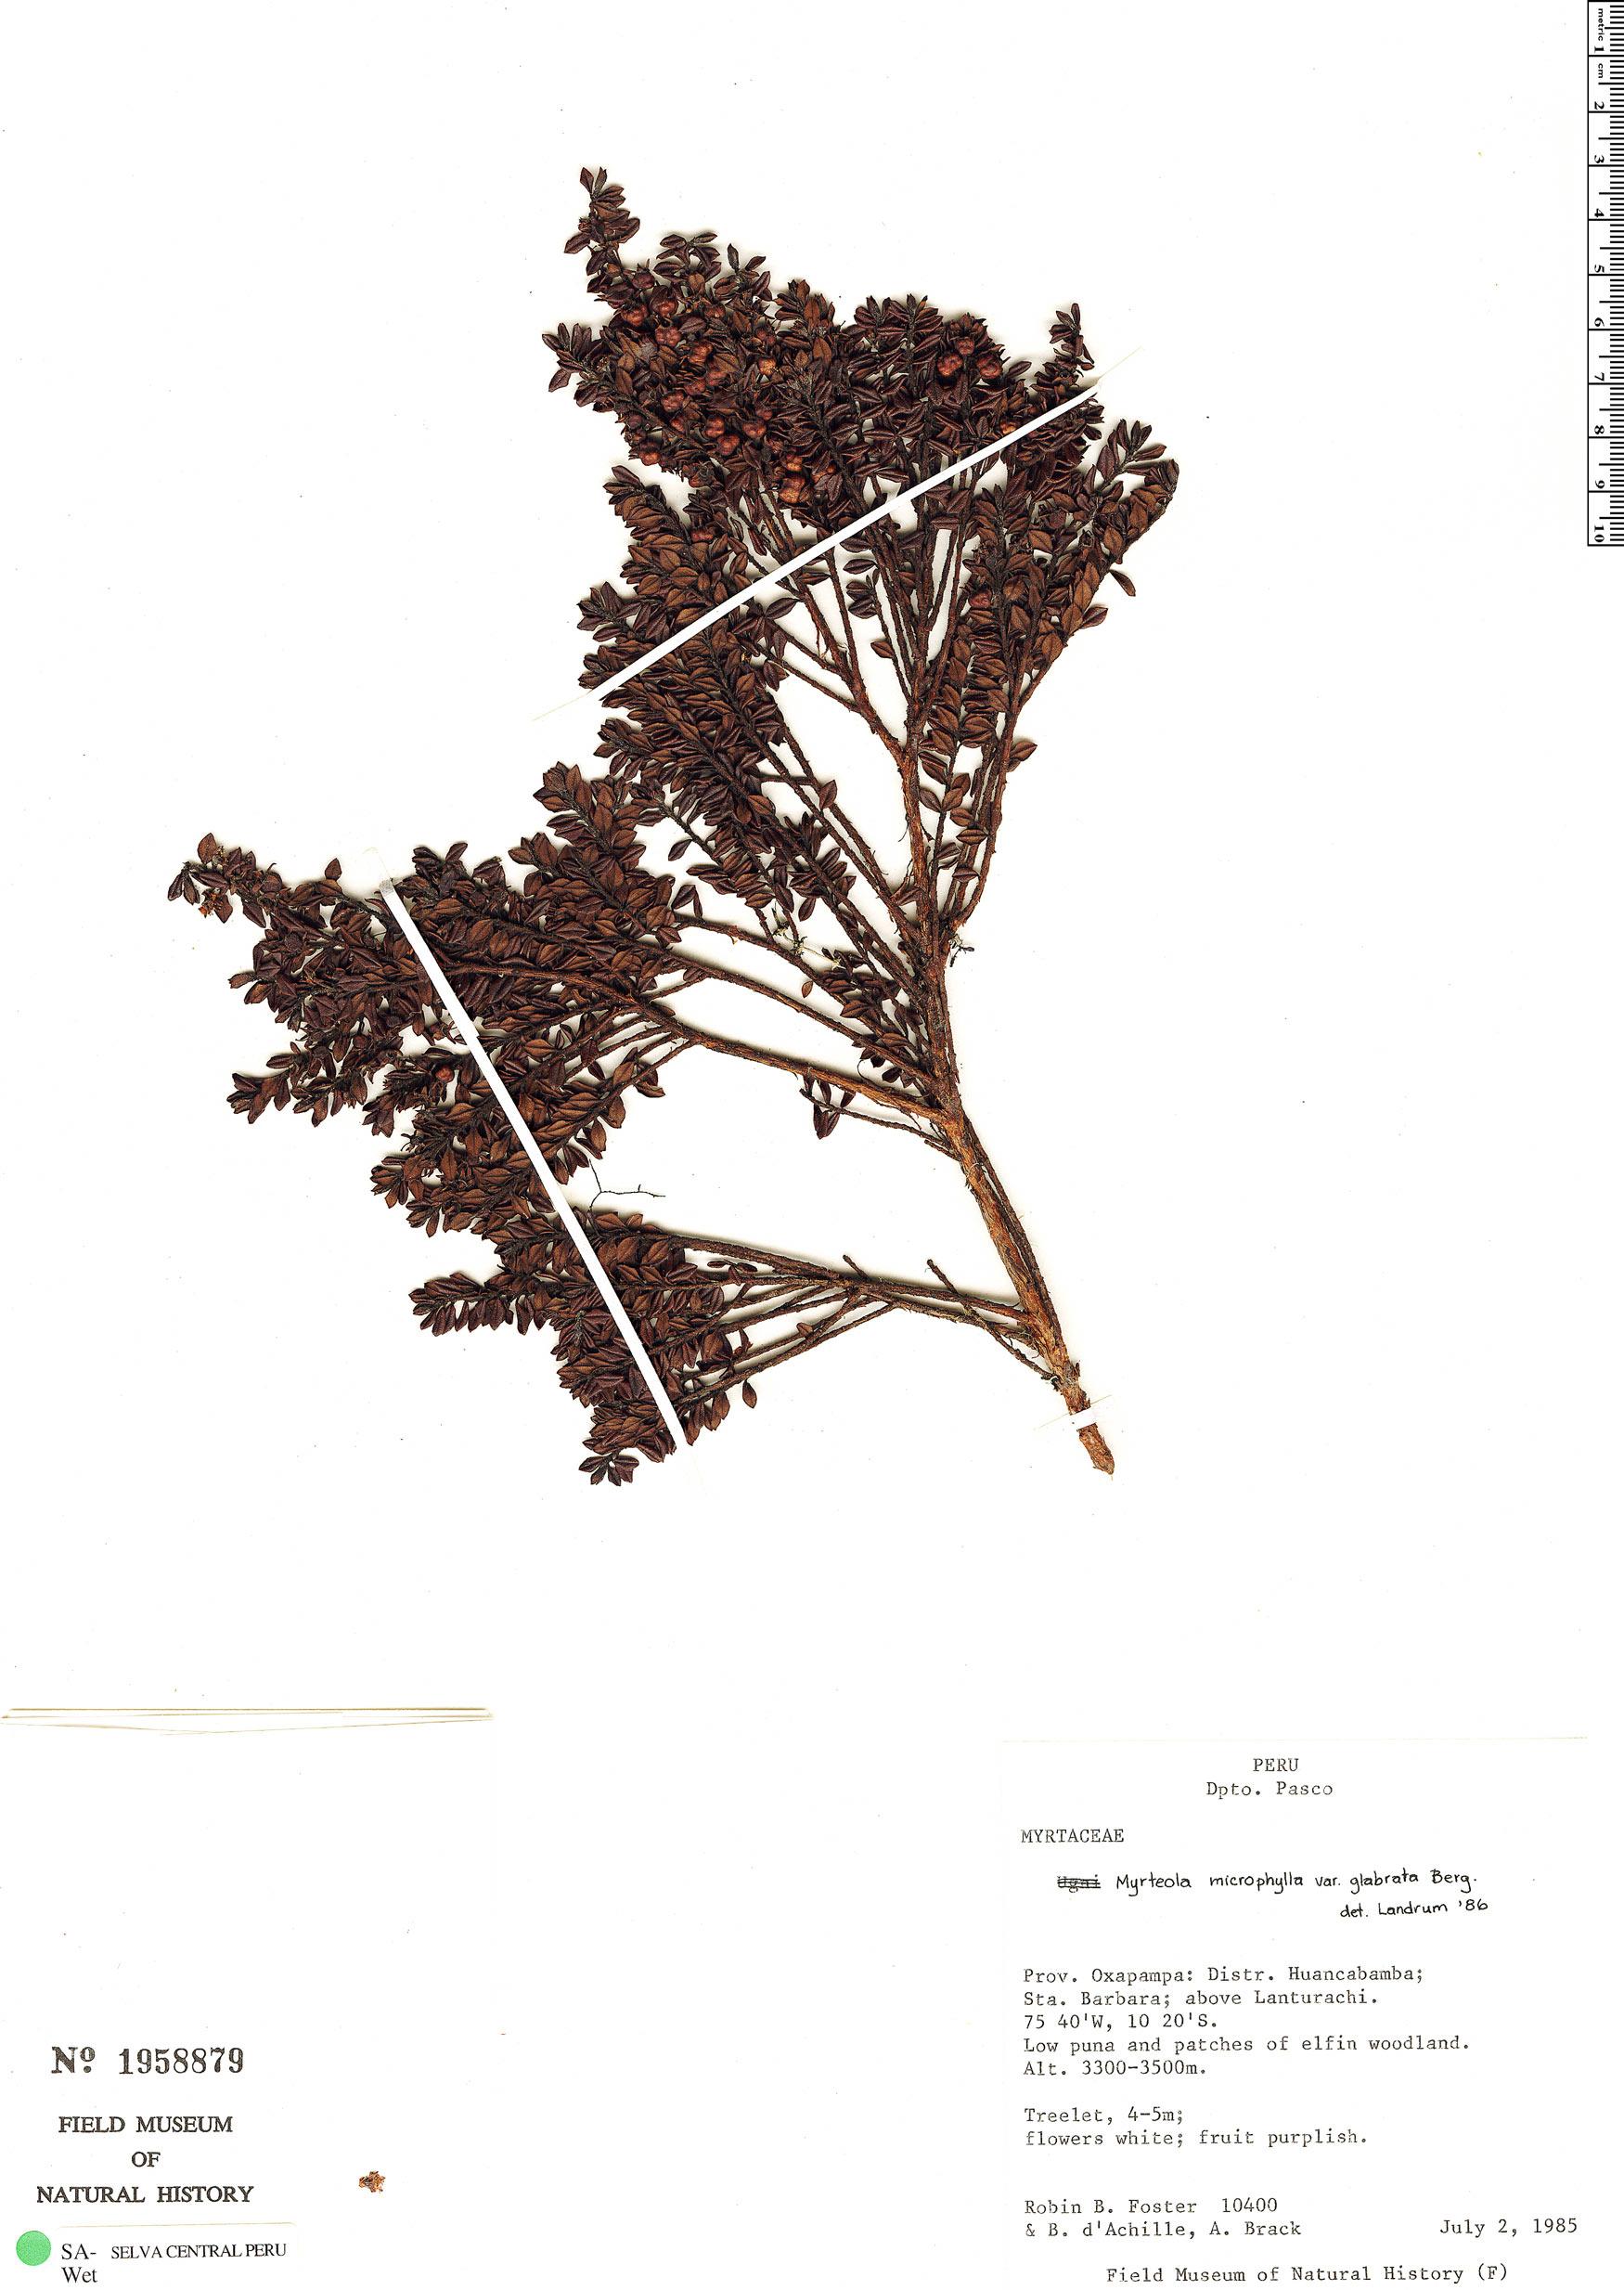 Specimen: Myrteola phylicoides